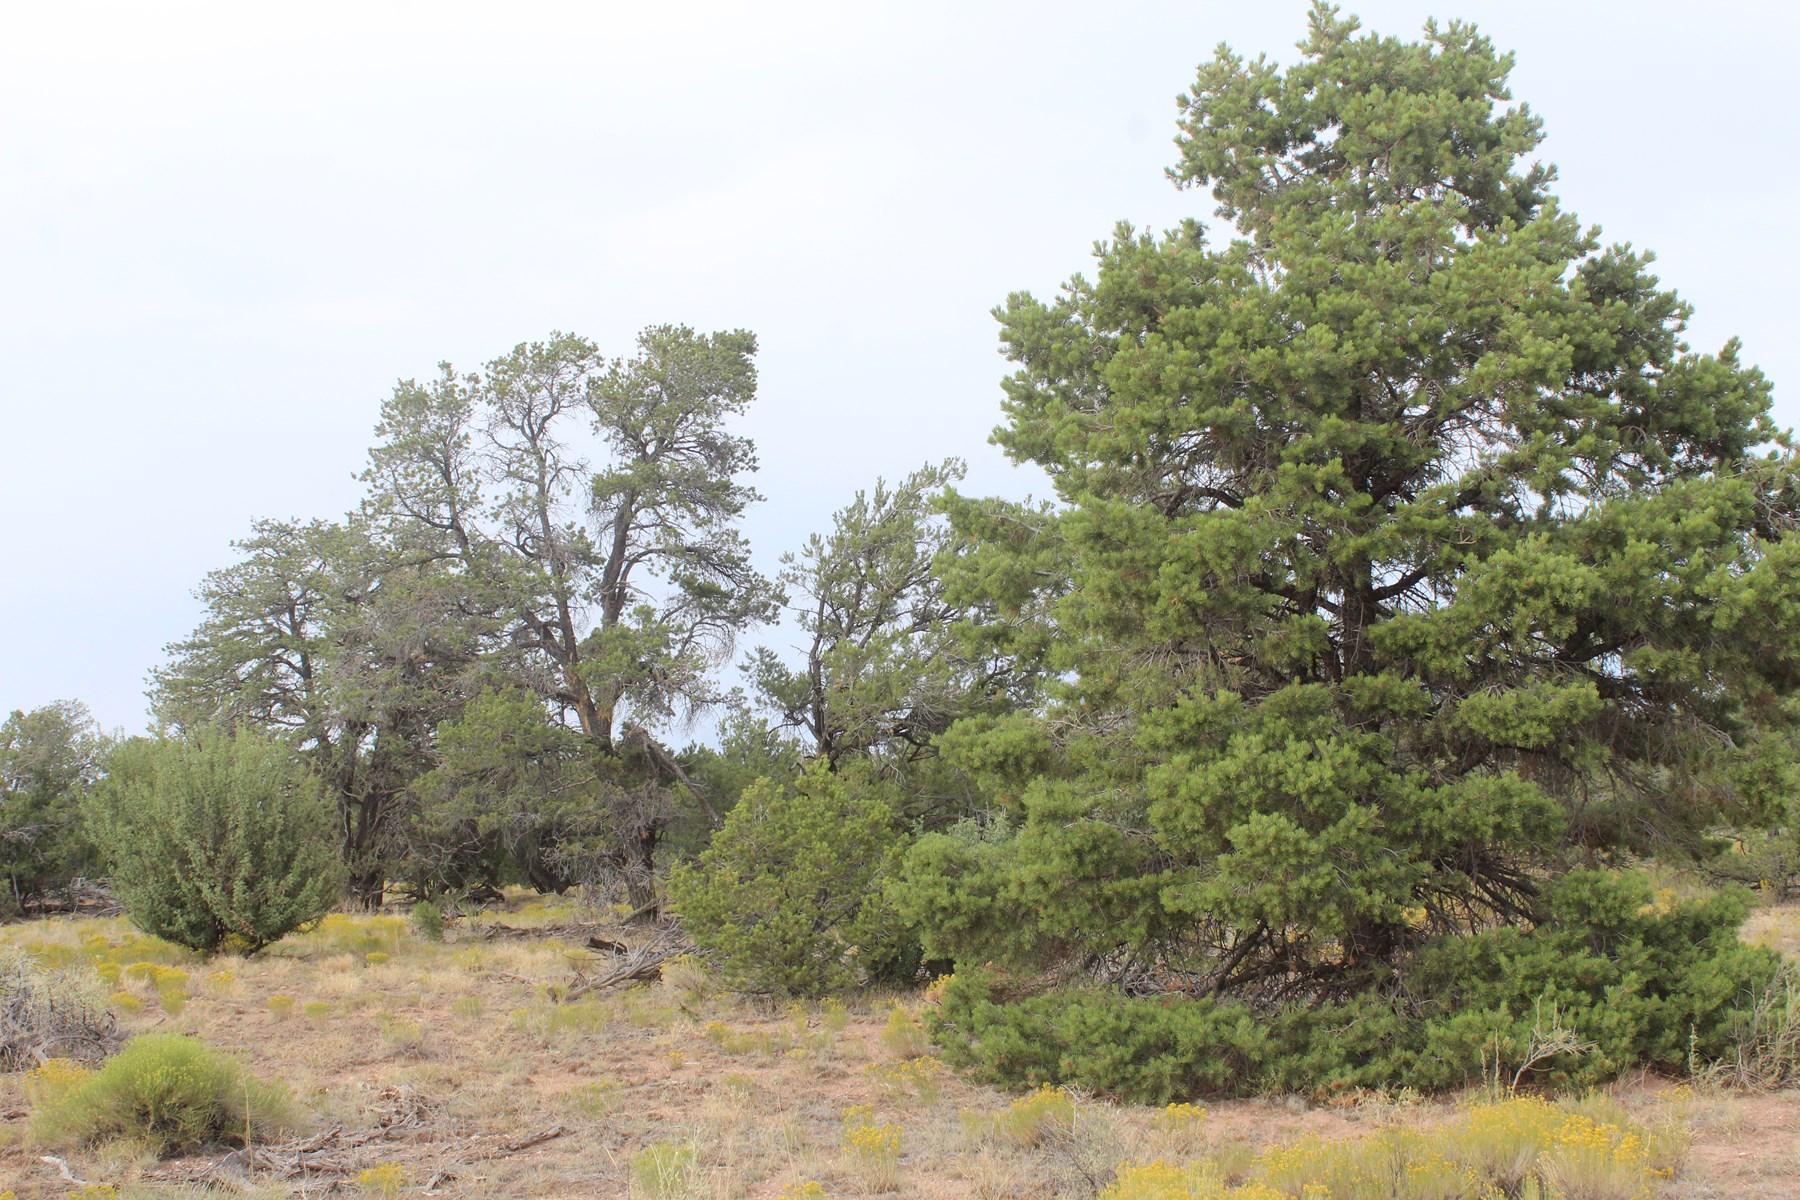 Treed Acreage for sale north of Williams, AZ